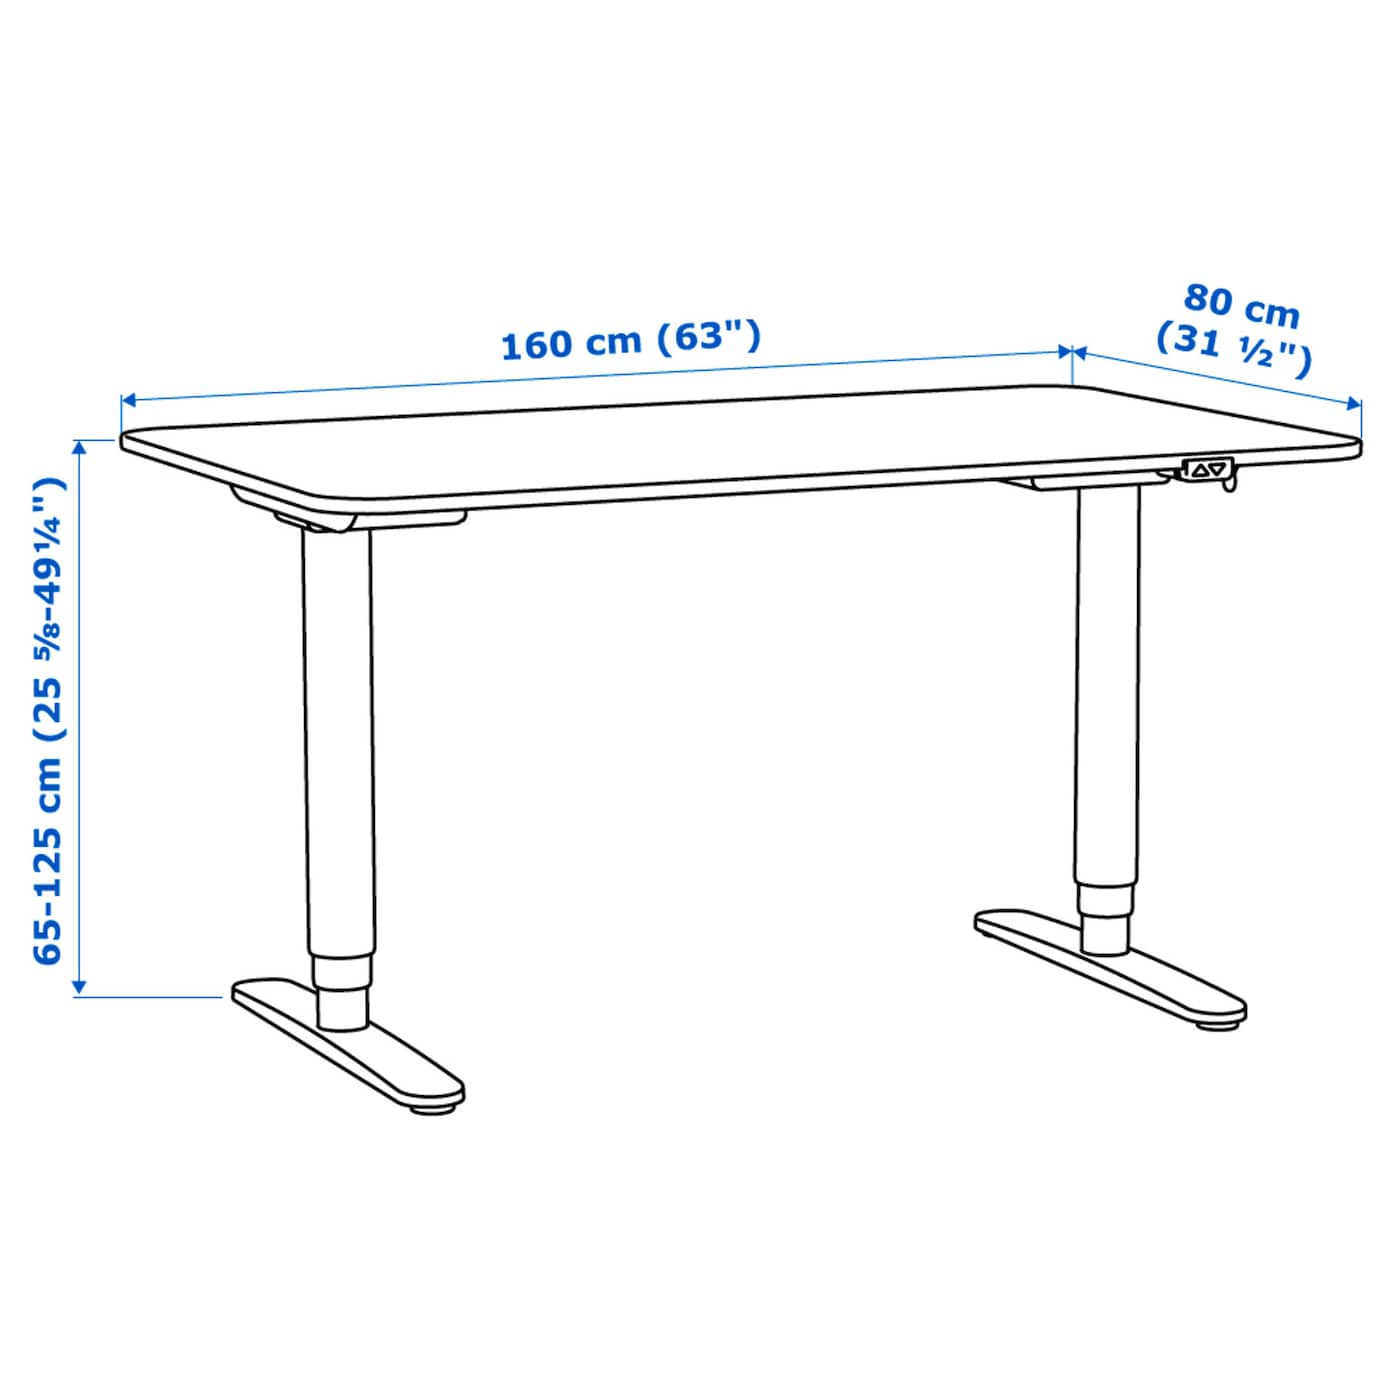 BEKANT Skrivbord, vitlaserad ekfaner, svart, 120x80 cm IKEA